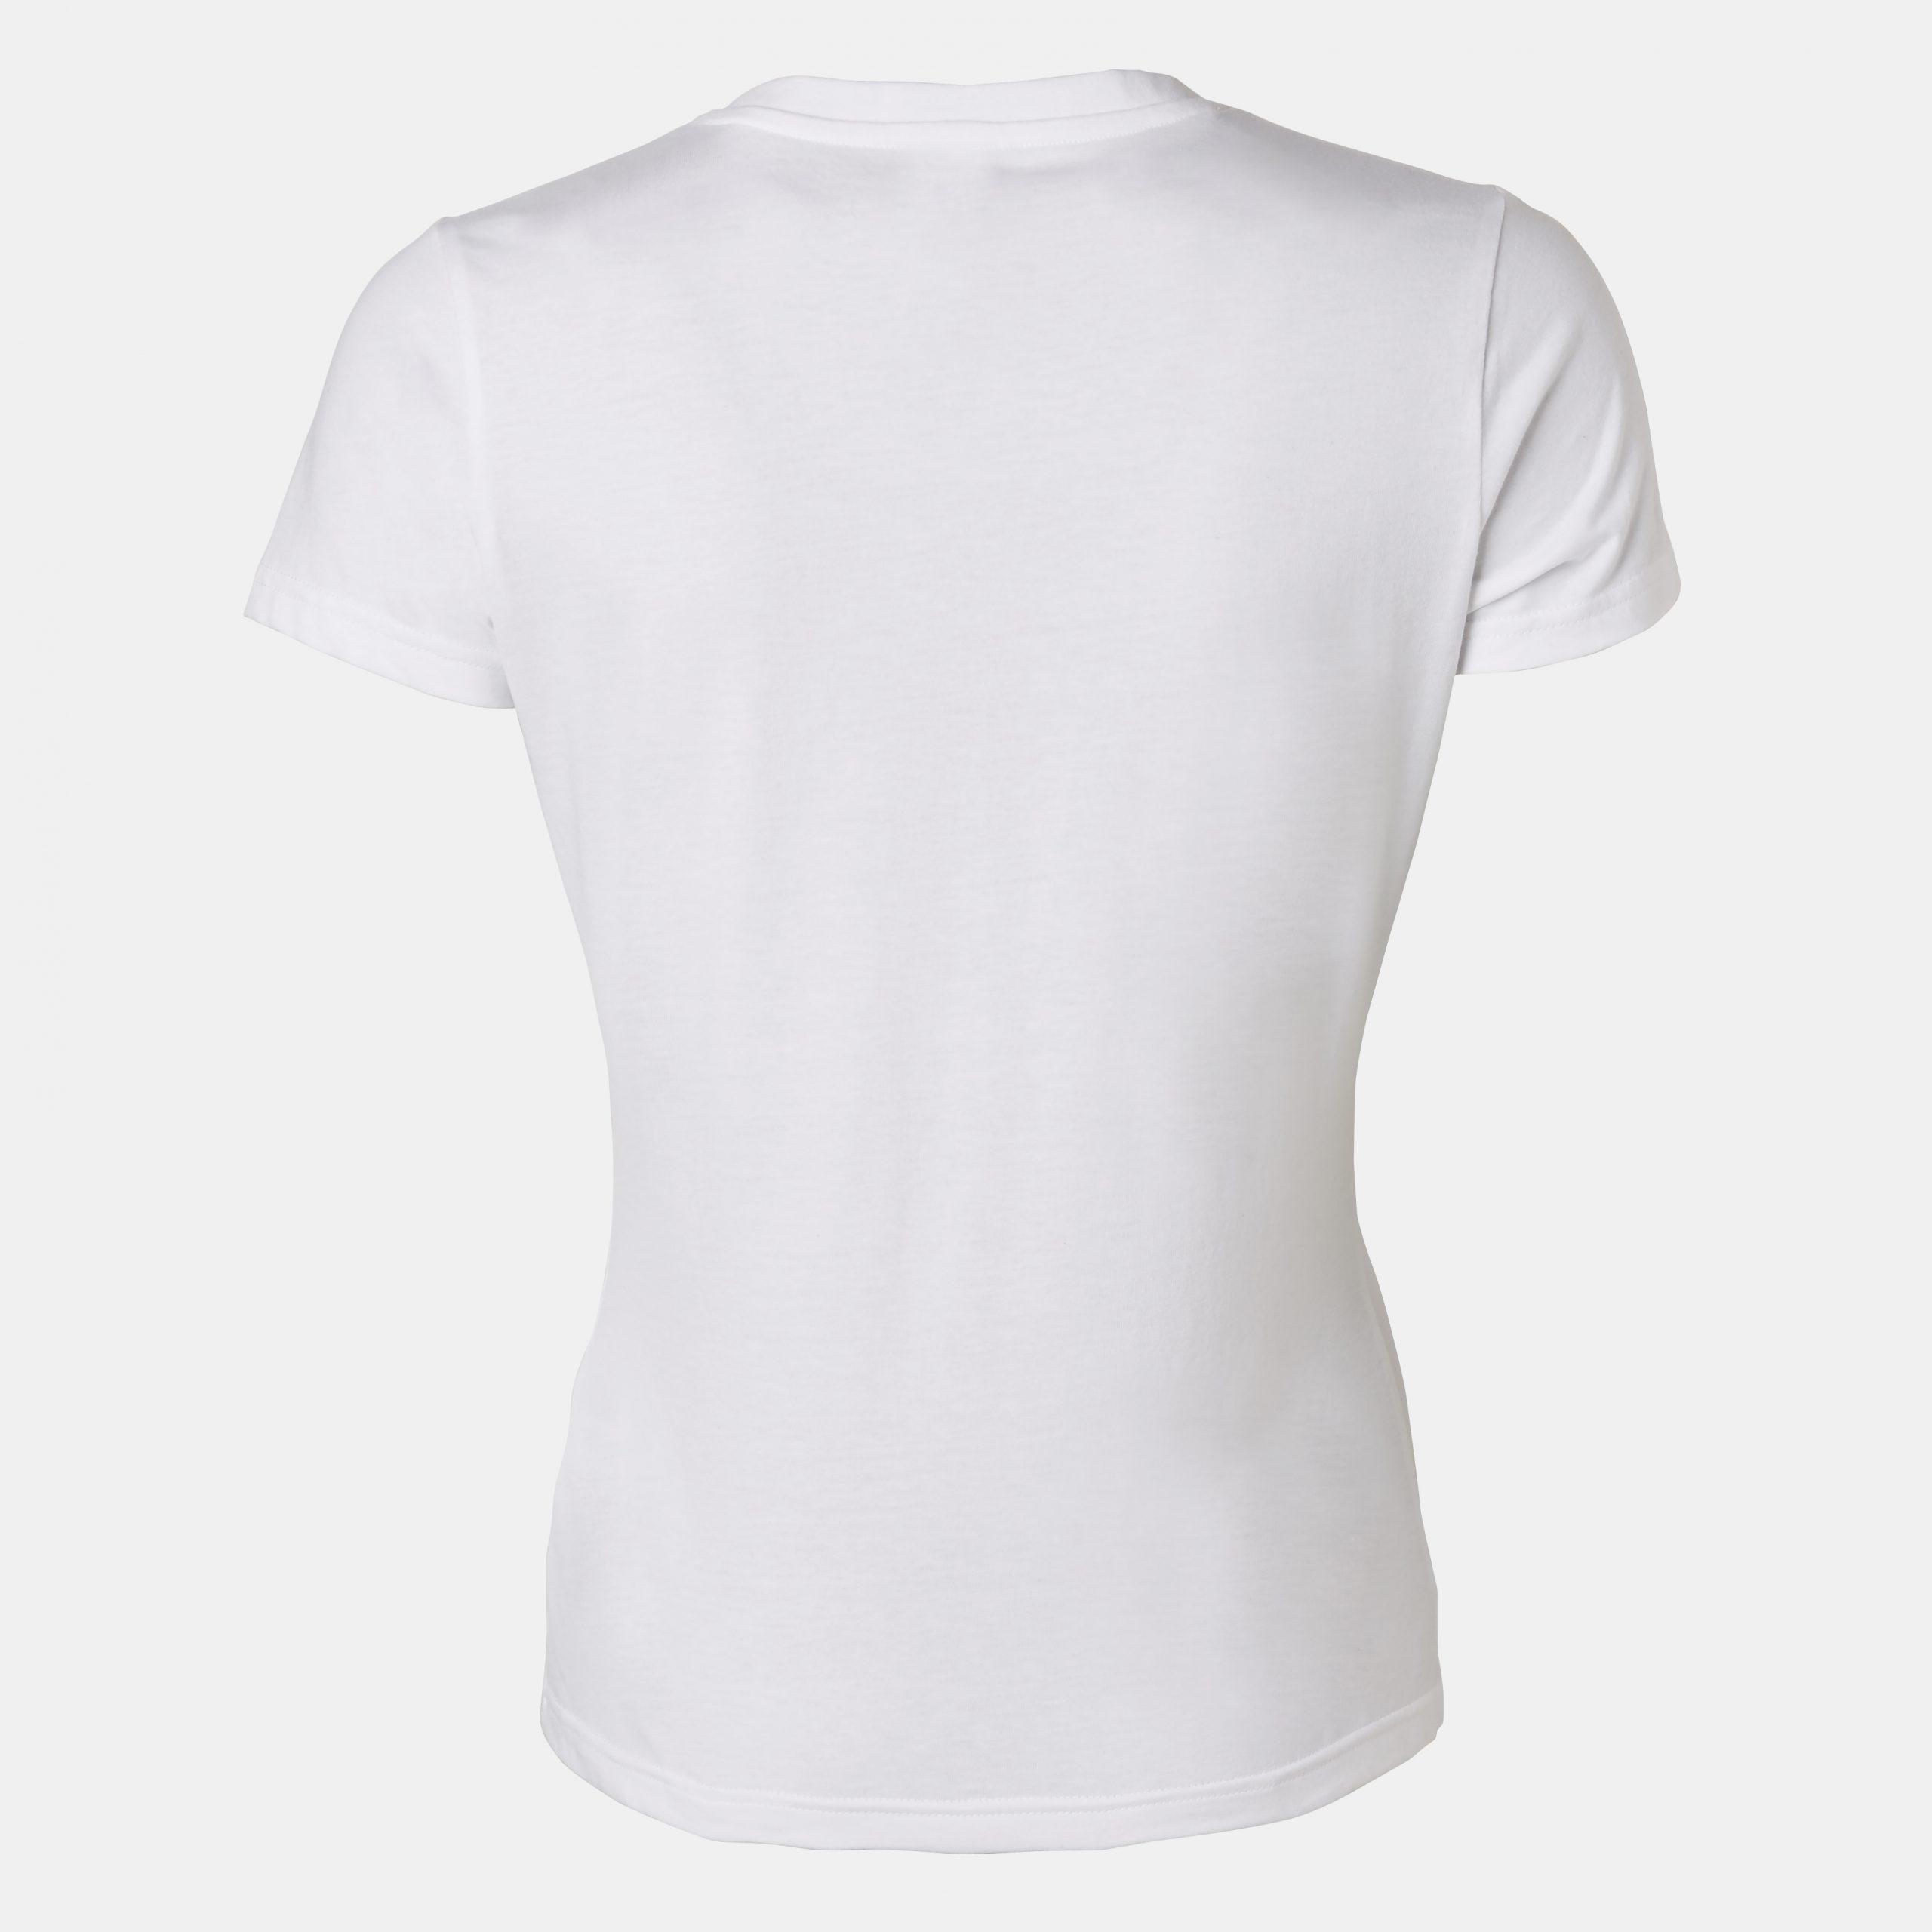 VMC112639210S T-shirt-damska-biała